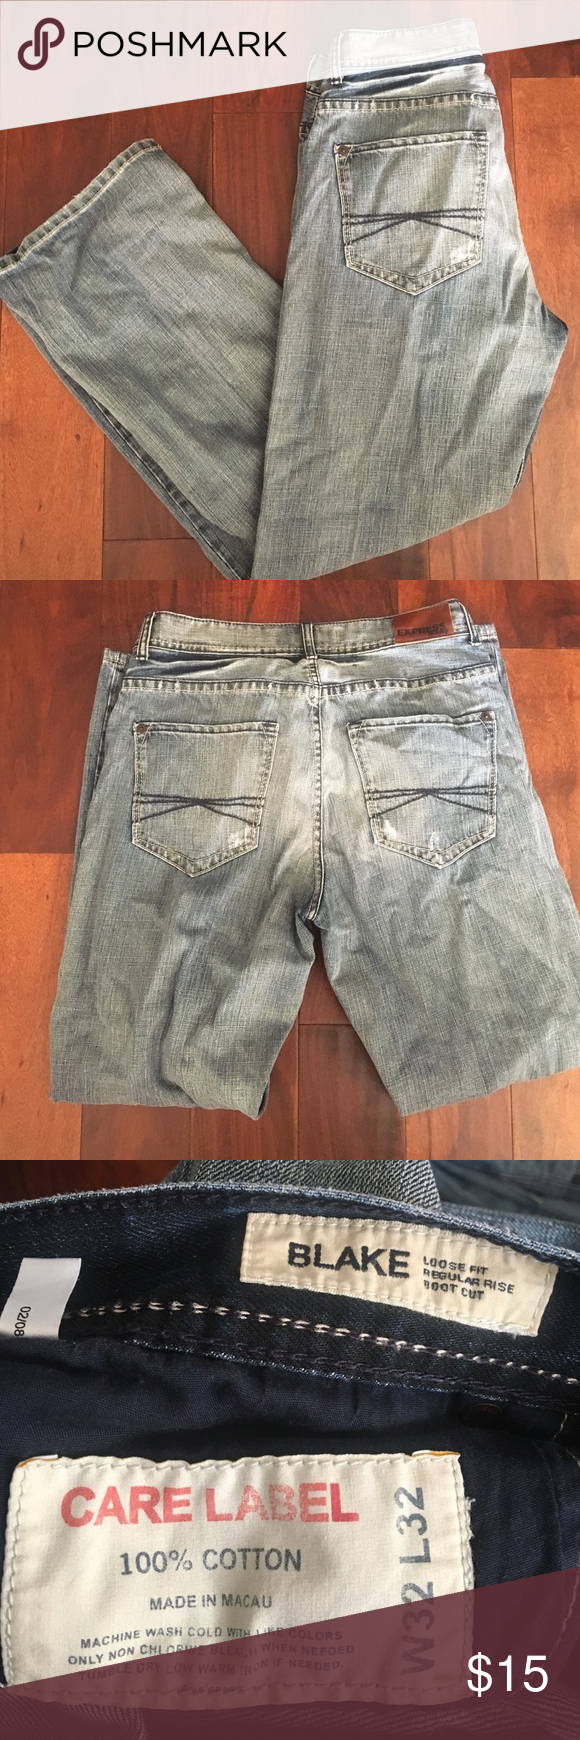 👖Men's express Blake Jeans👖 32x32 Men's Blake jeans - gently worn. Loose fit, regular rise, boot cut. Light wash color Express Jeans Bootcut